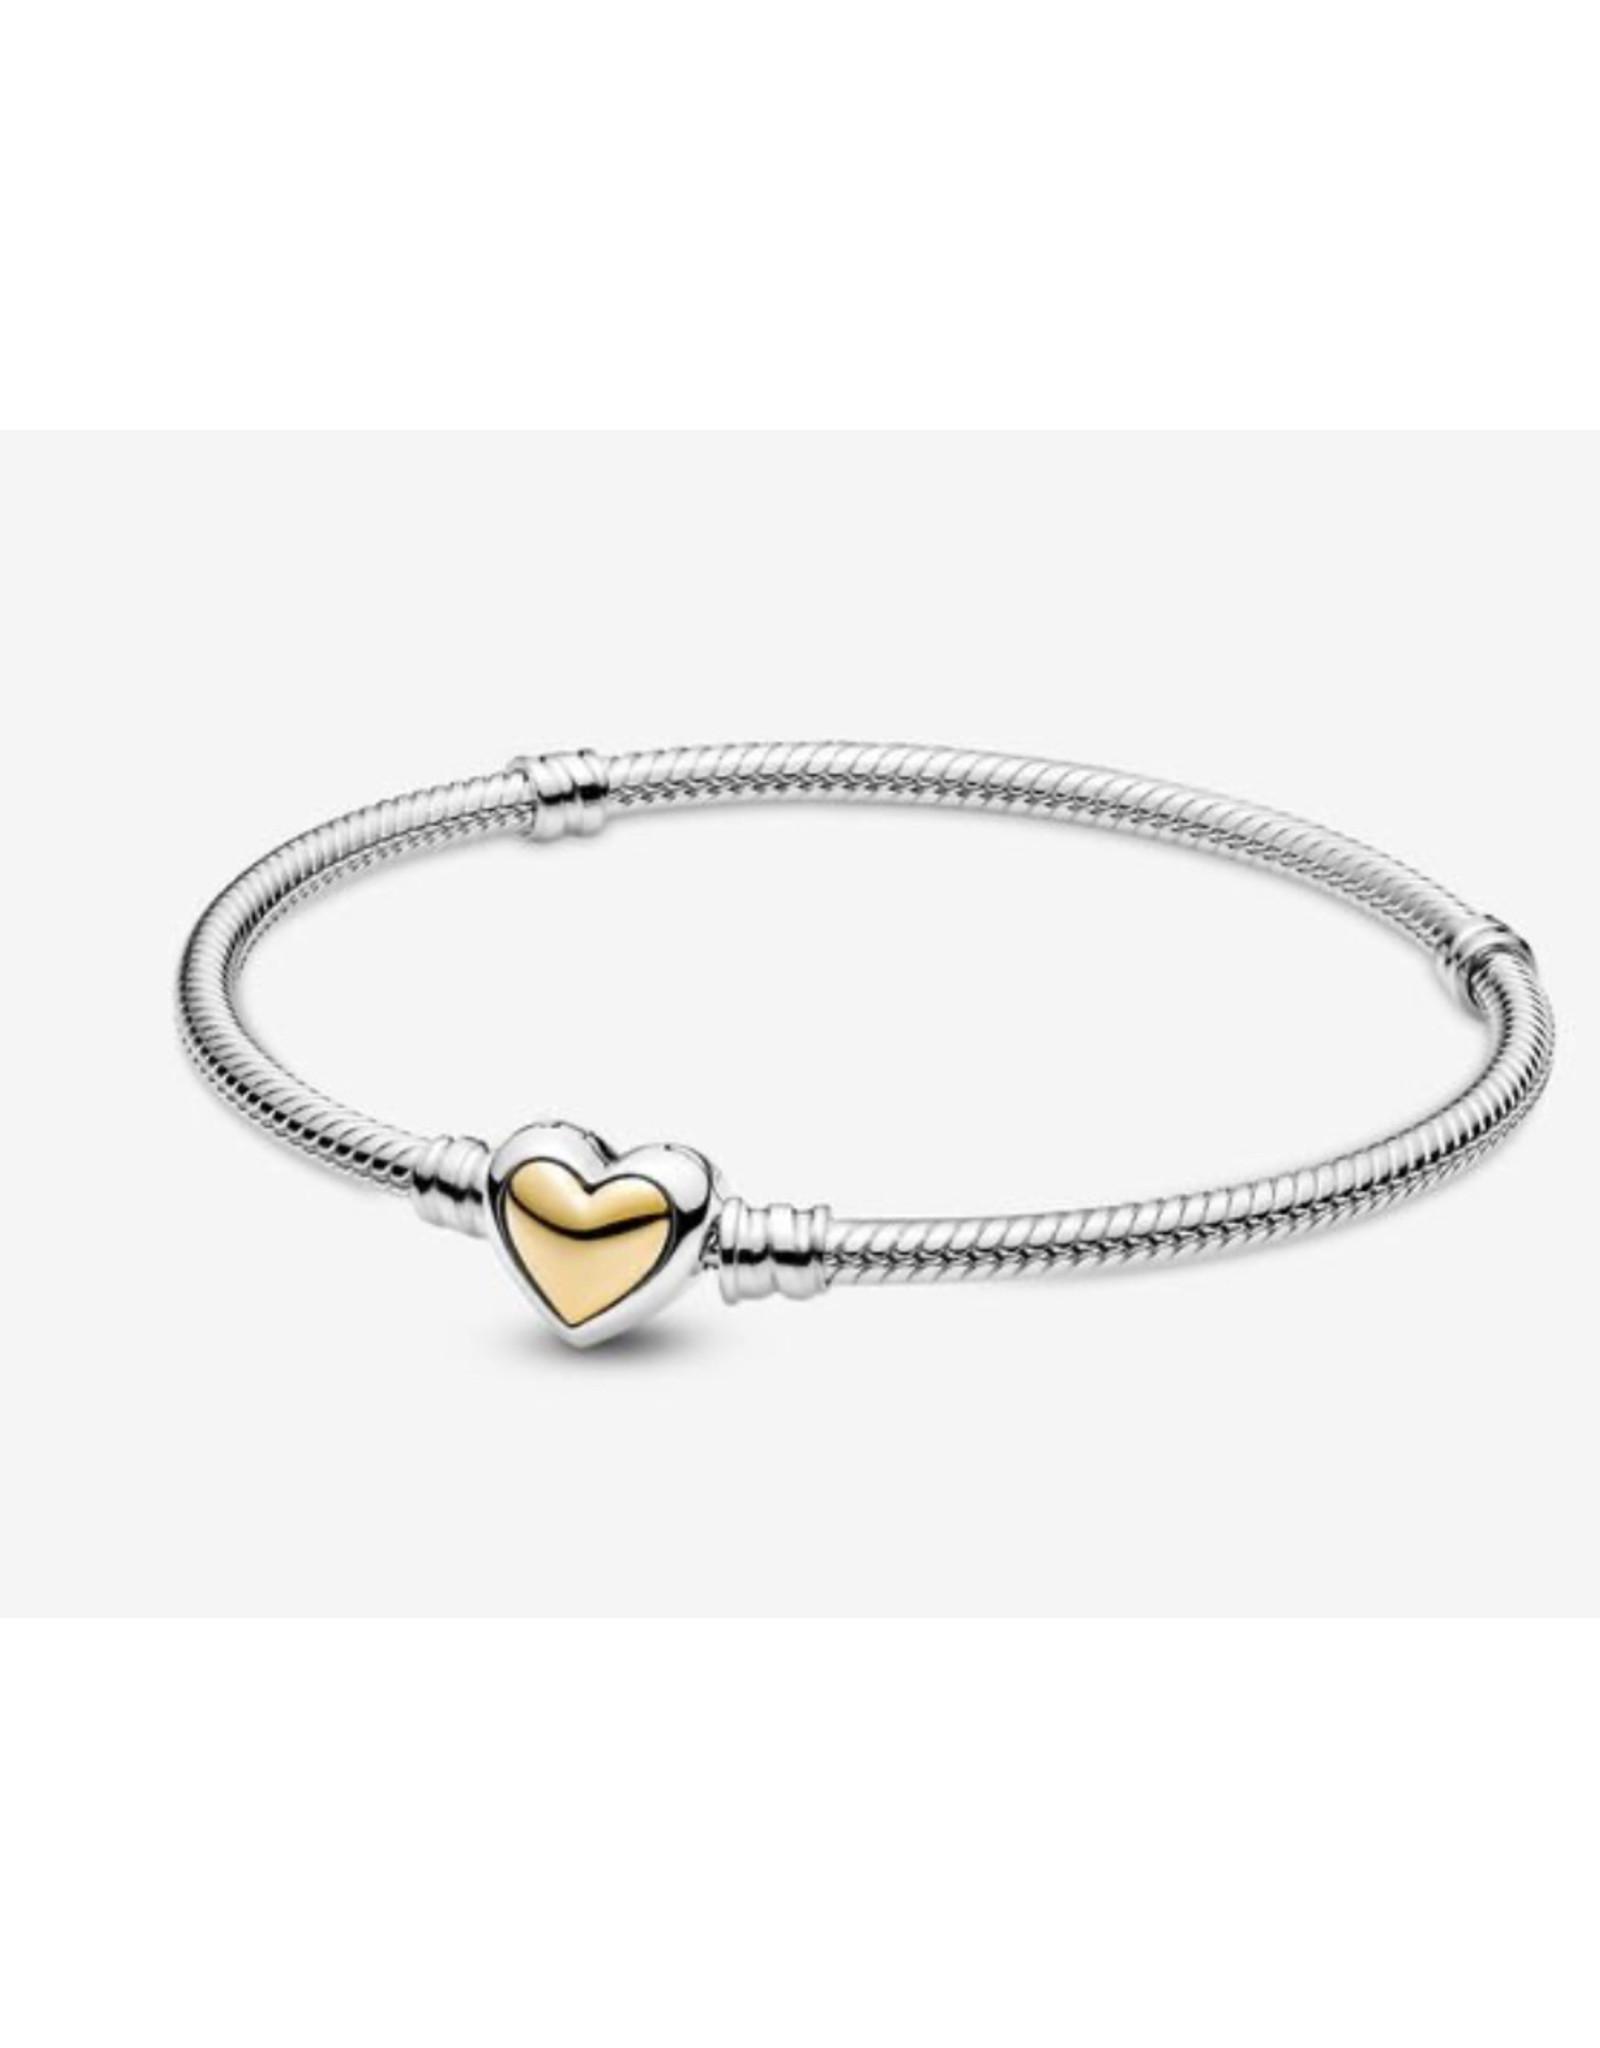 Pandora Pandora Bracelet,599380C00, Domed Golden Heart Clasp Snake Chain, With 14K Gold